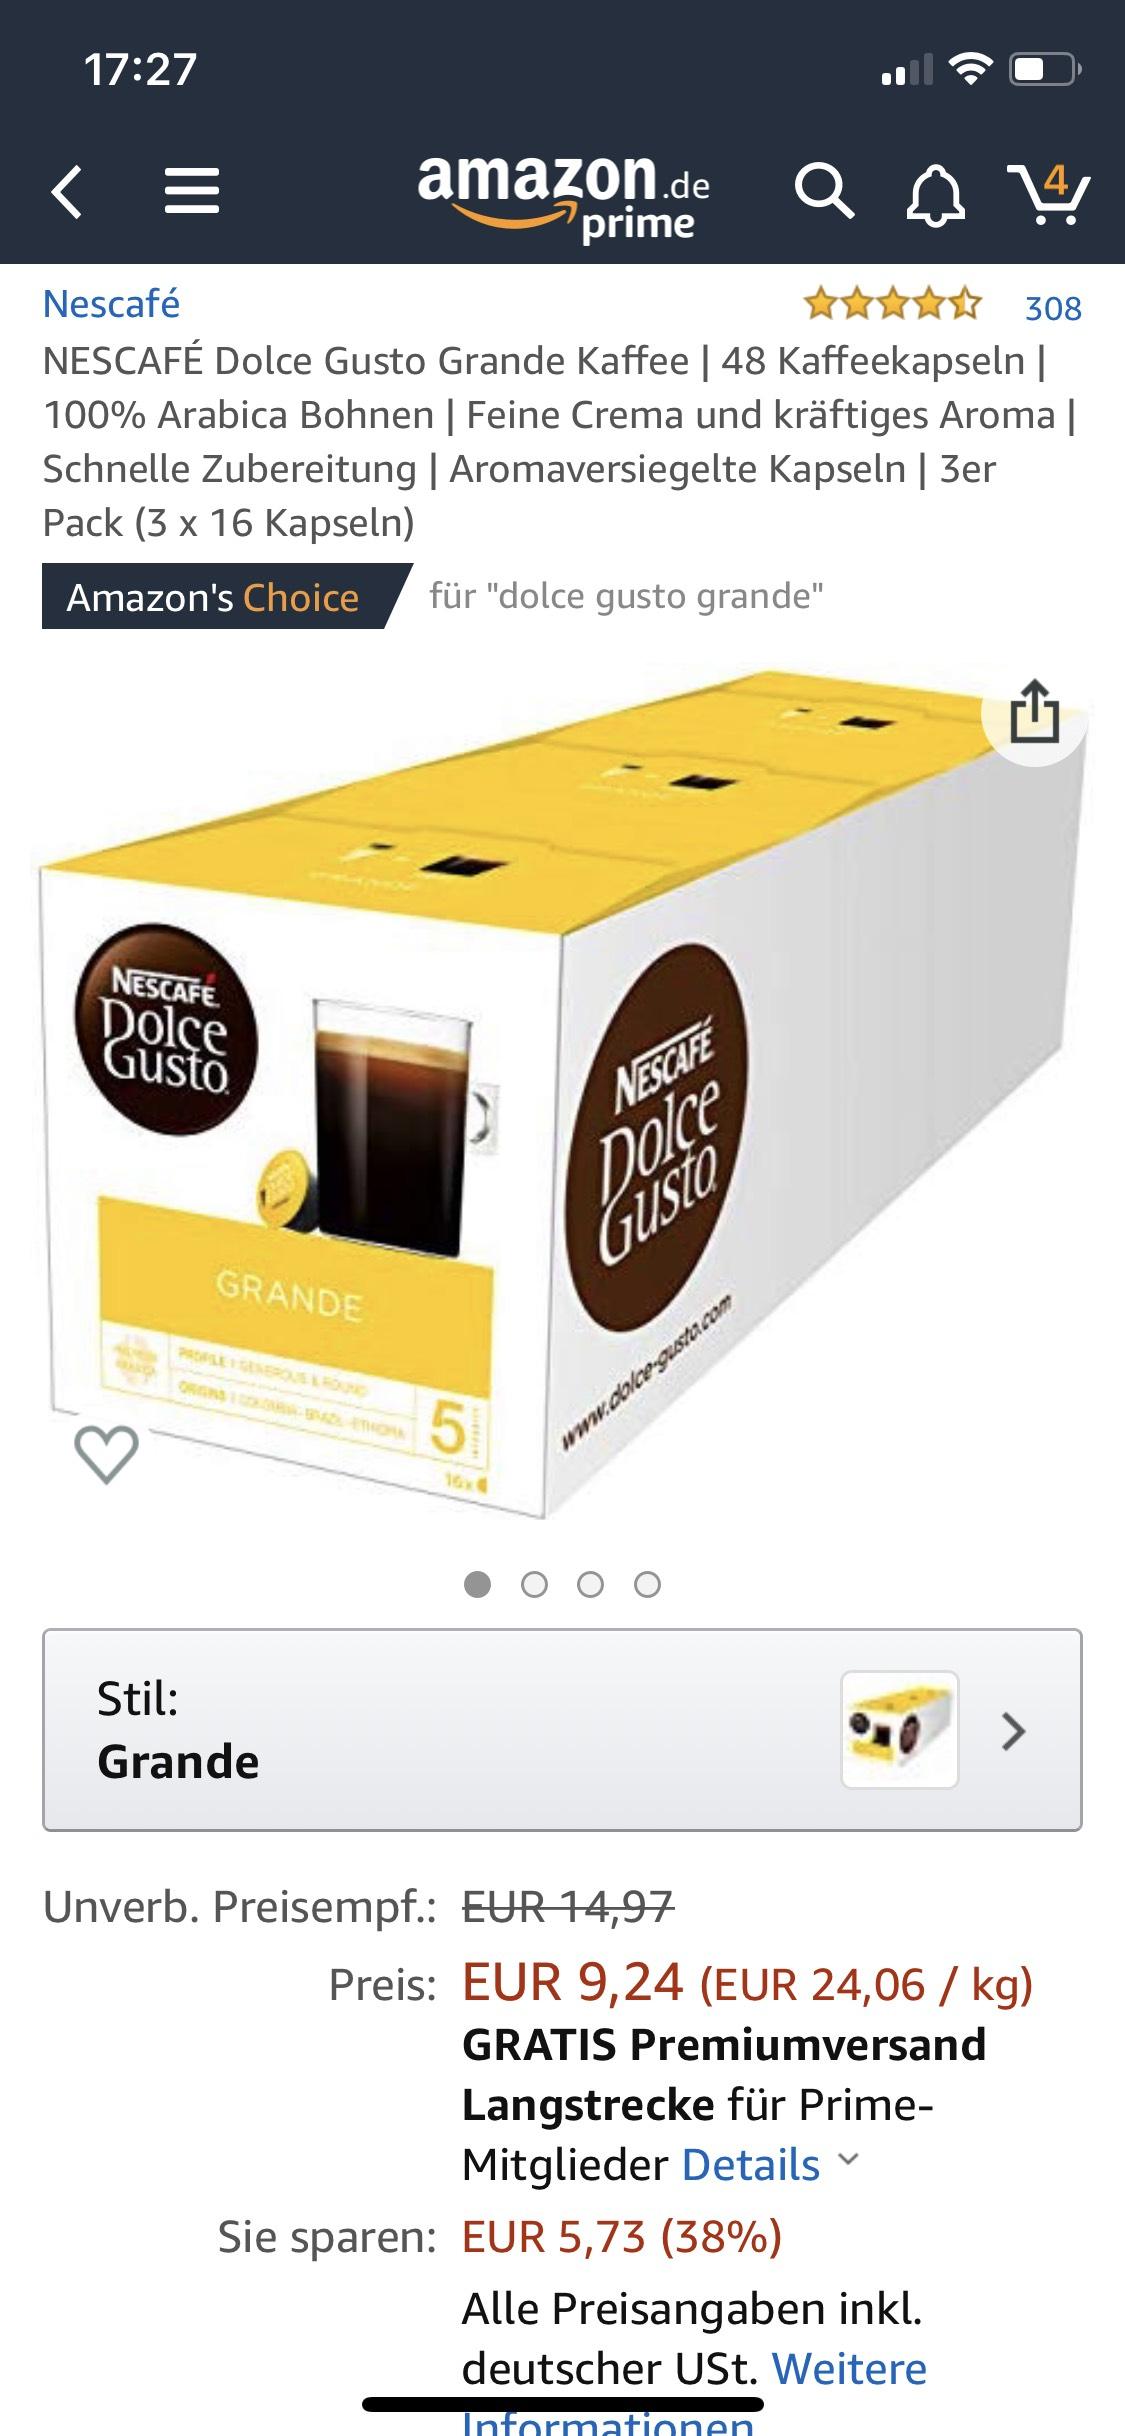 Amazon Prime only: NESCAFÉ Dolce Gusto Grande Kaffee | 48 Kaffeekapseln | 3er Pack (3x16 Kapseln)